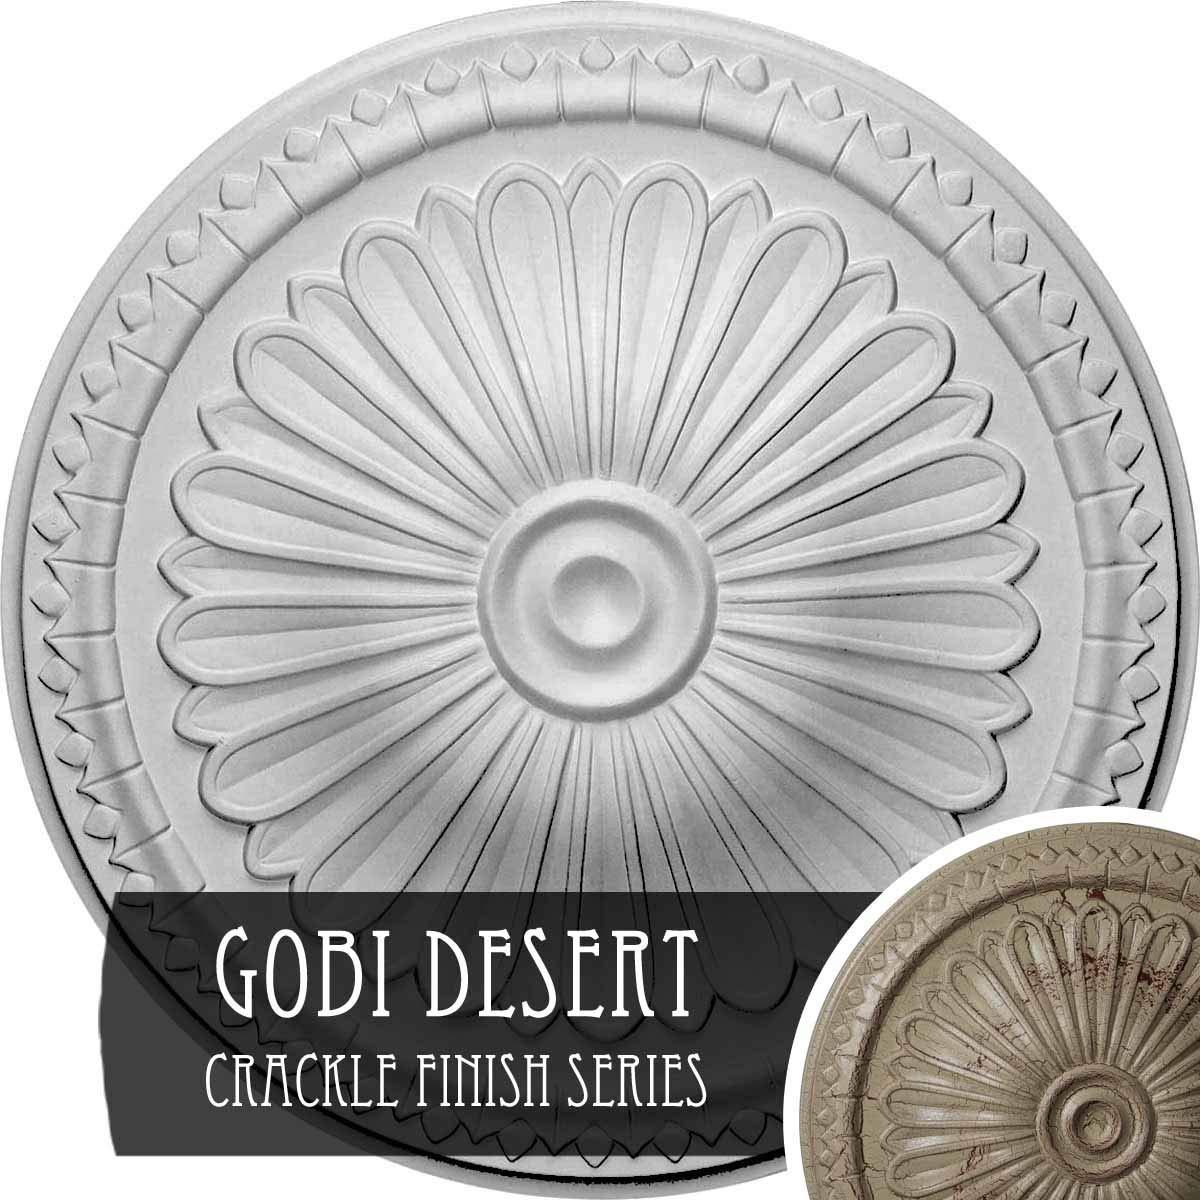 Ekena Millwork CM14AXGDC 15'' Od X 1 3/4'' P Alexa (fits Canopies up to 3''), Hand-Painted Ceiling Medallion, Gobi Desert Crackle